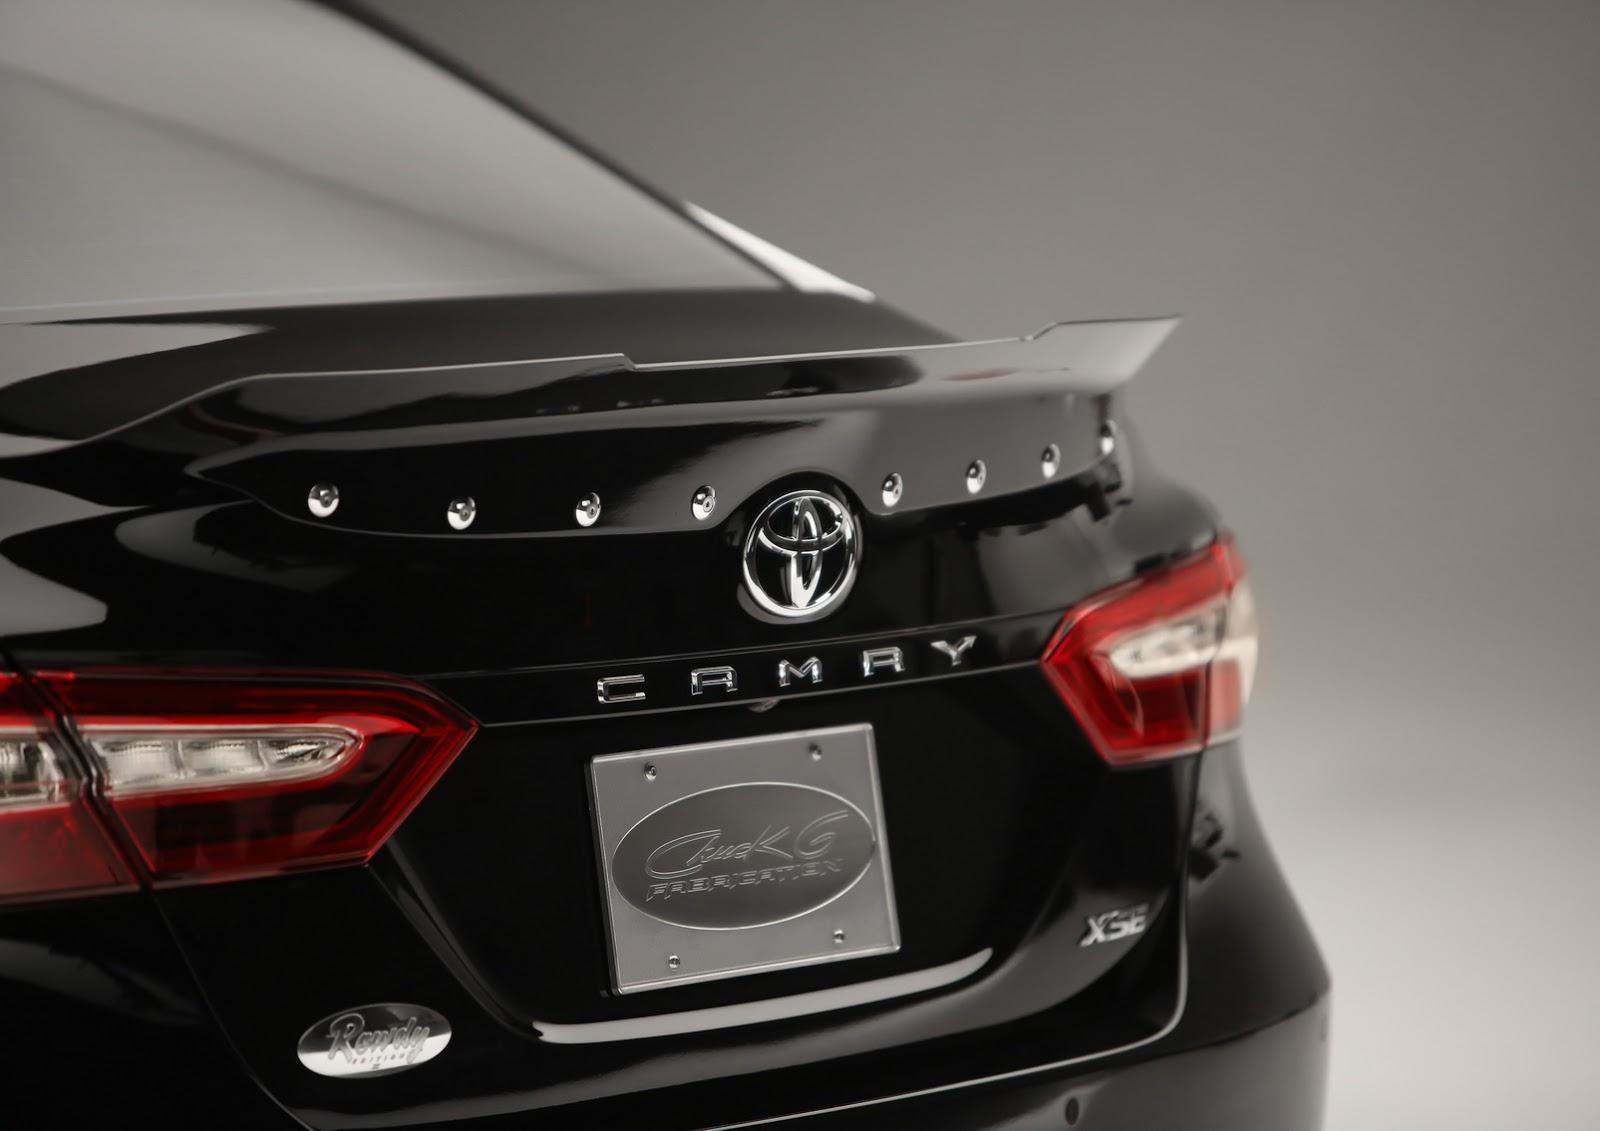 toyota-sema-2017-cars-29